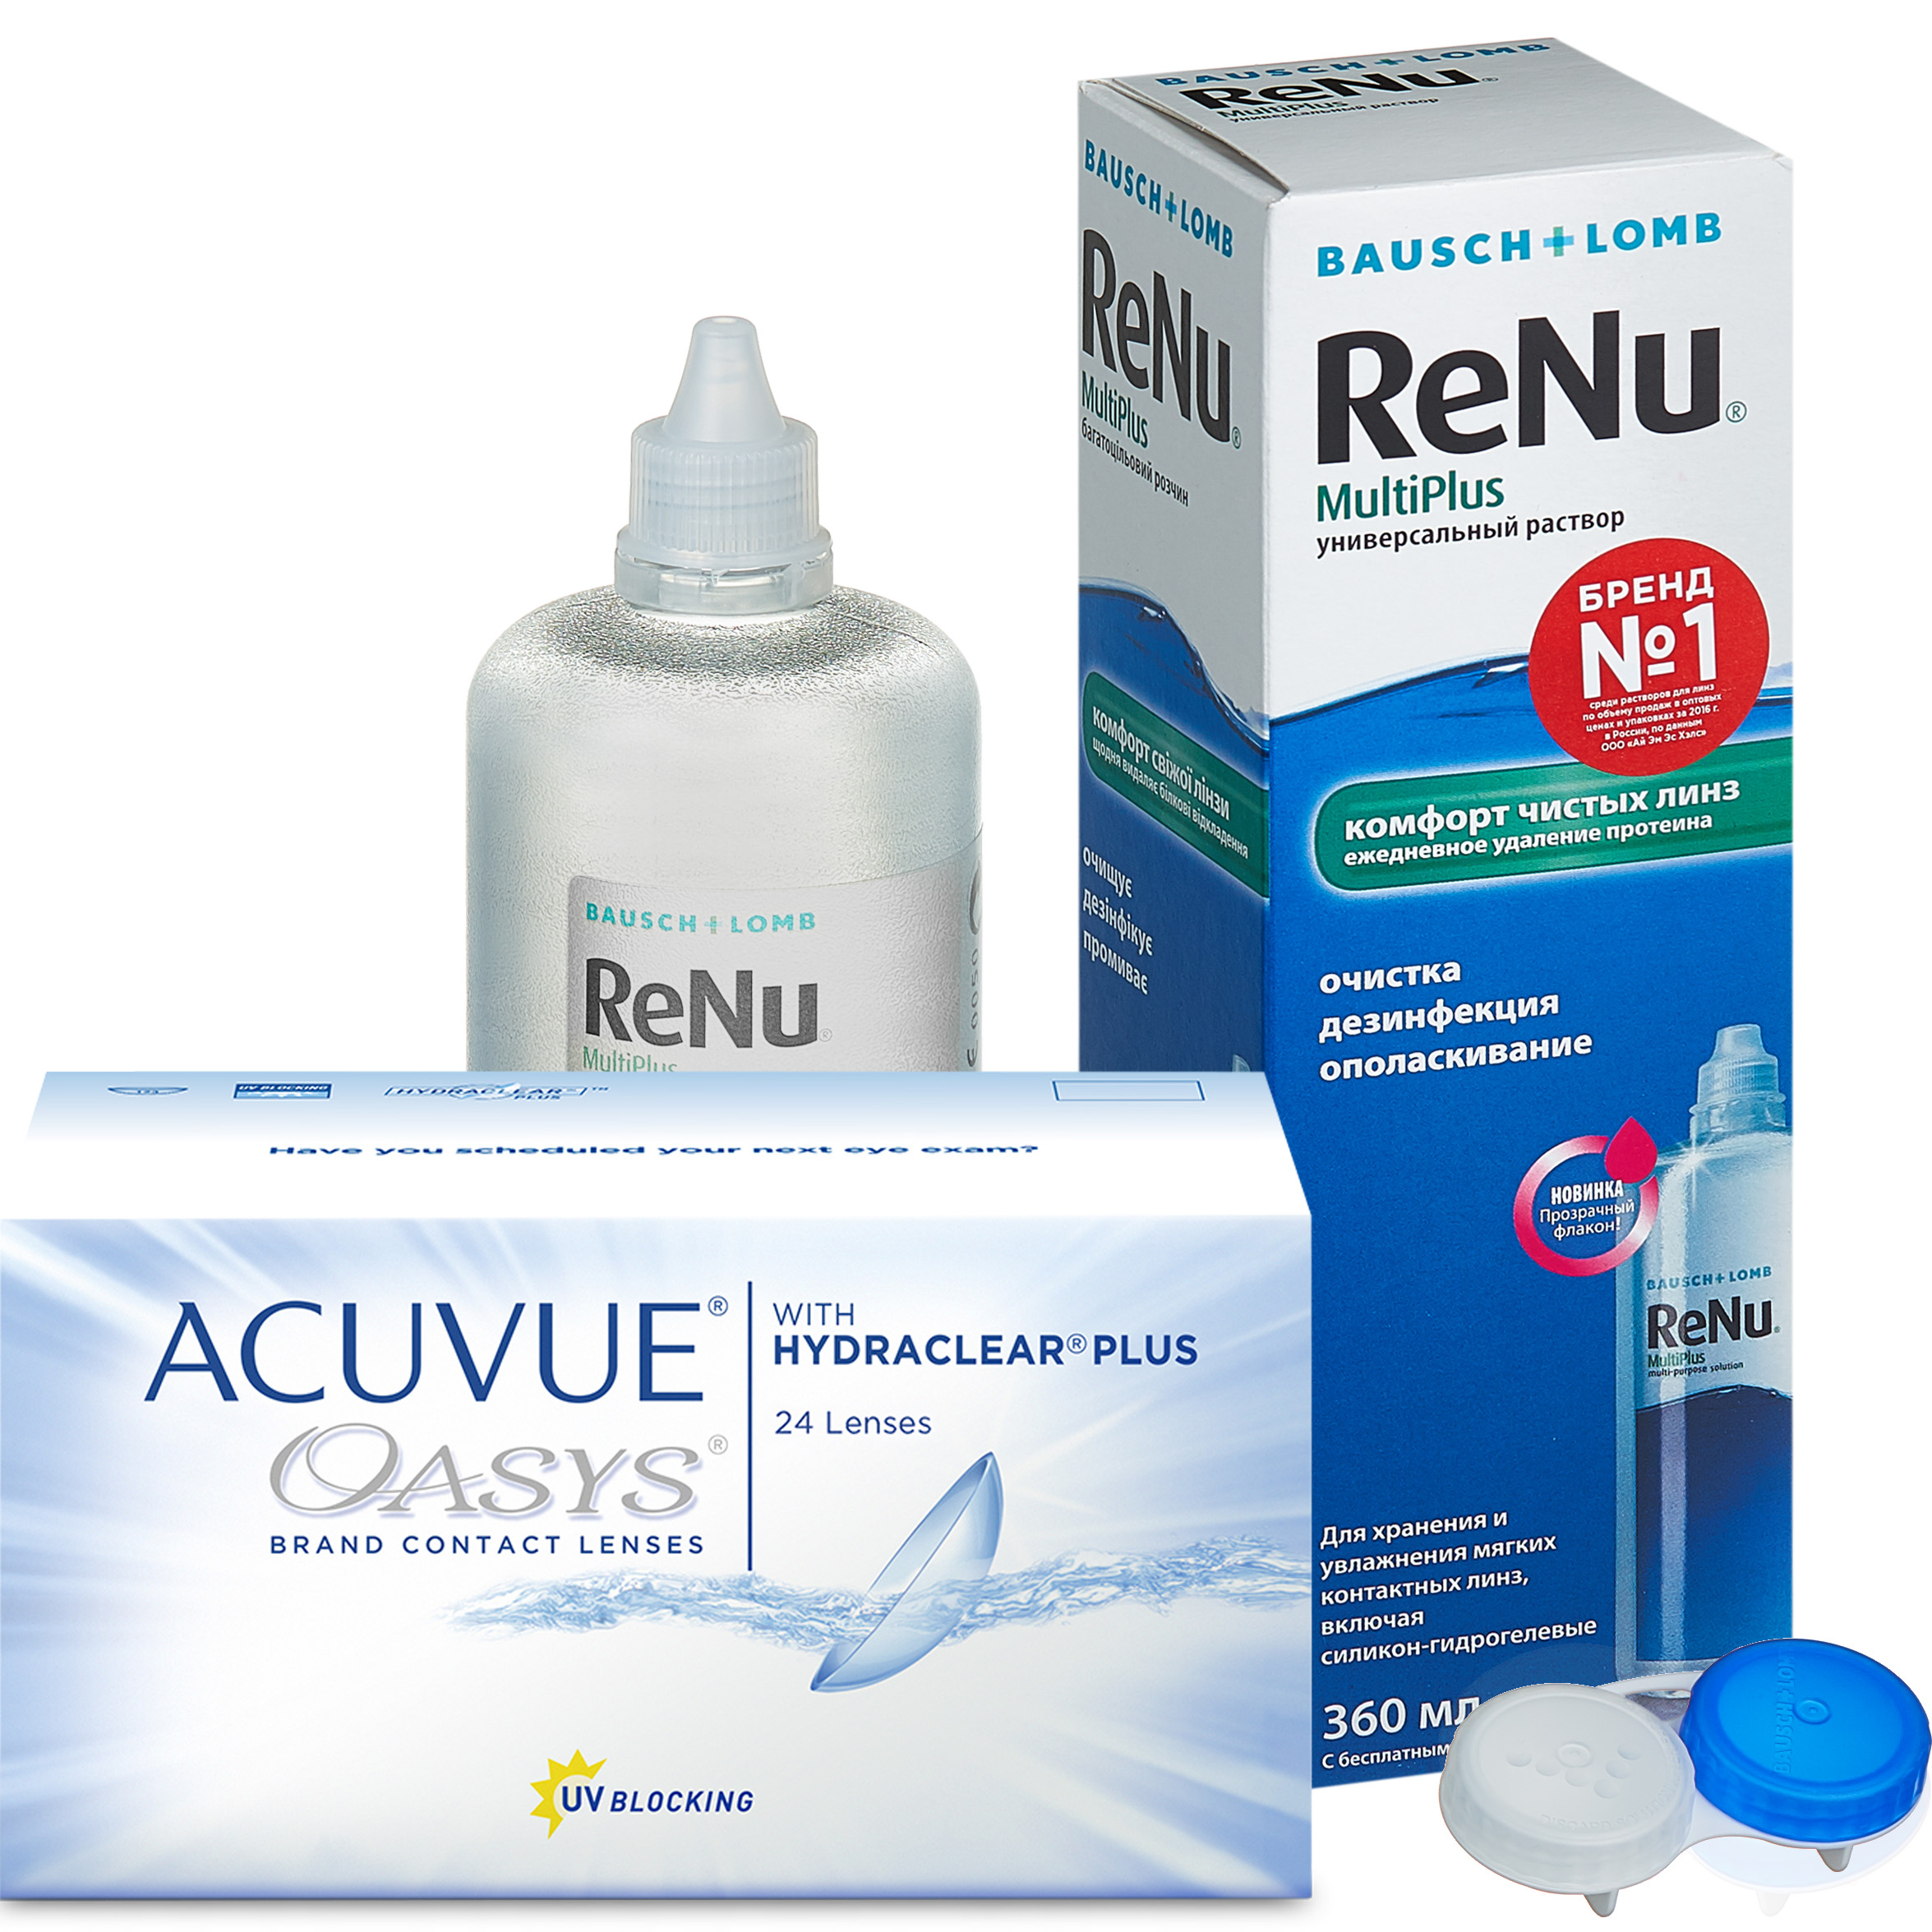 Купить Oasys with Hydraclear Plus 24 линзы + ReNu MultiPlus, Линзы Acuvue Oasys with Hydraclear Plus 24 линзы R 8.4 -7, 50 + ReNu Multi Plus 360 мл